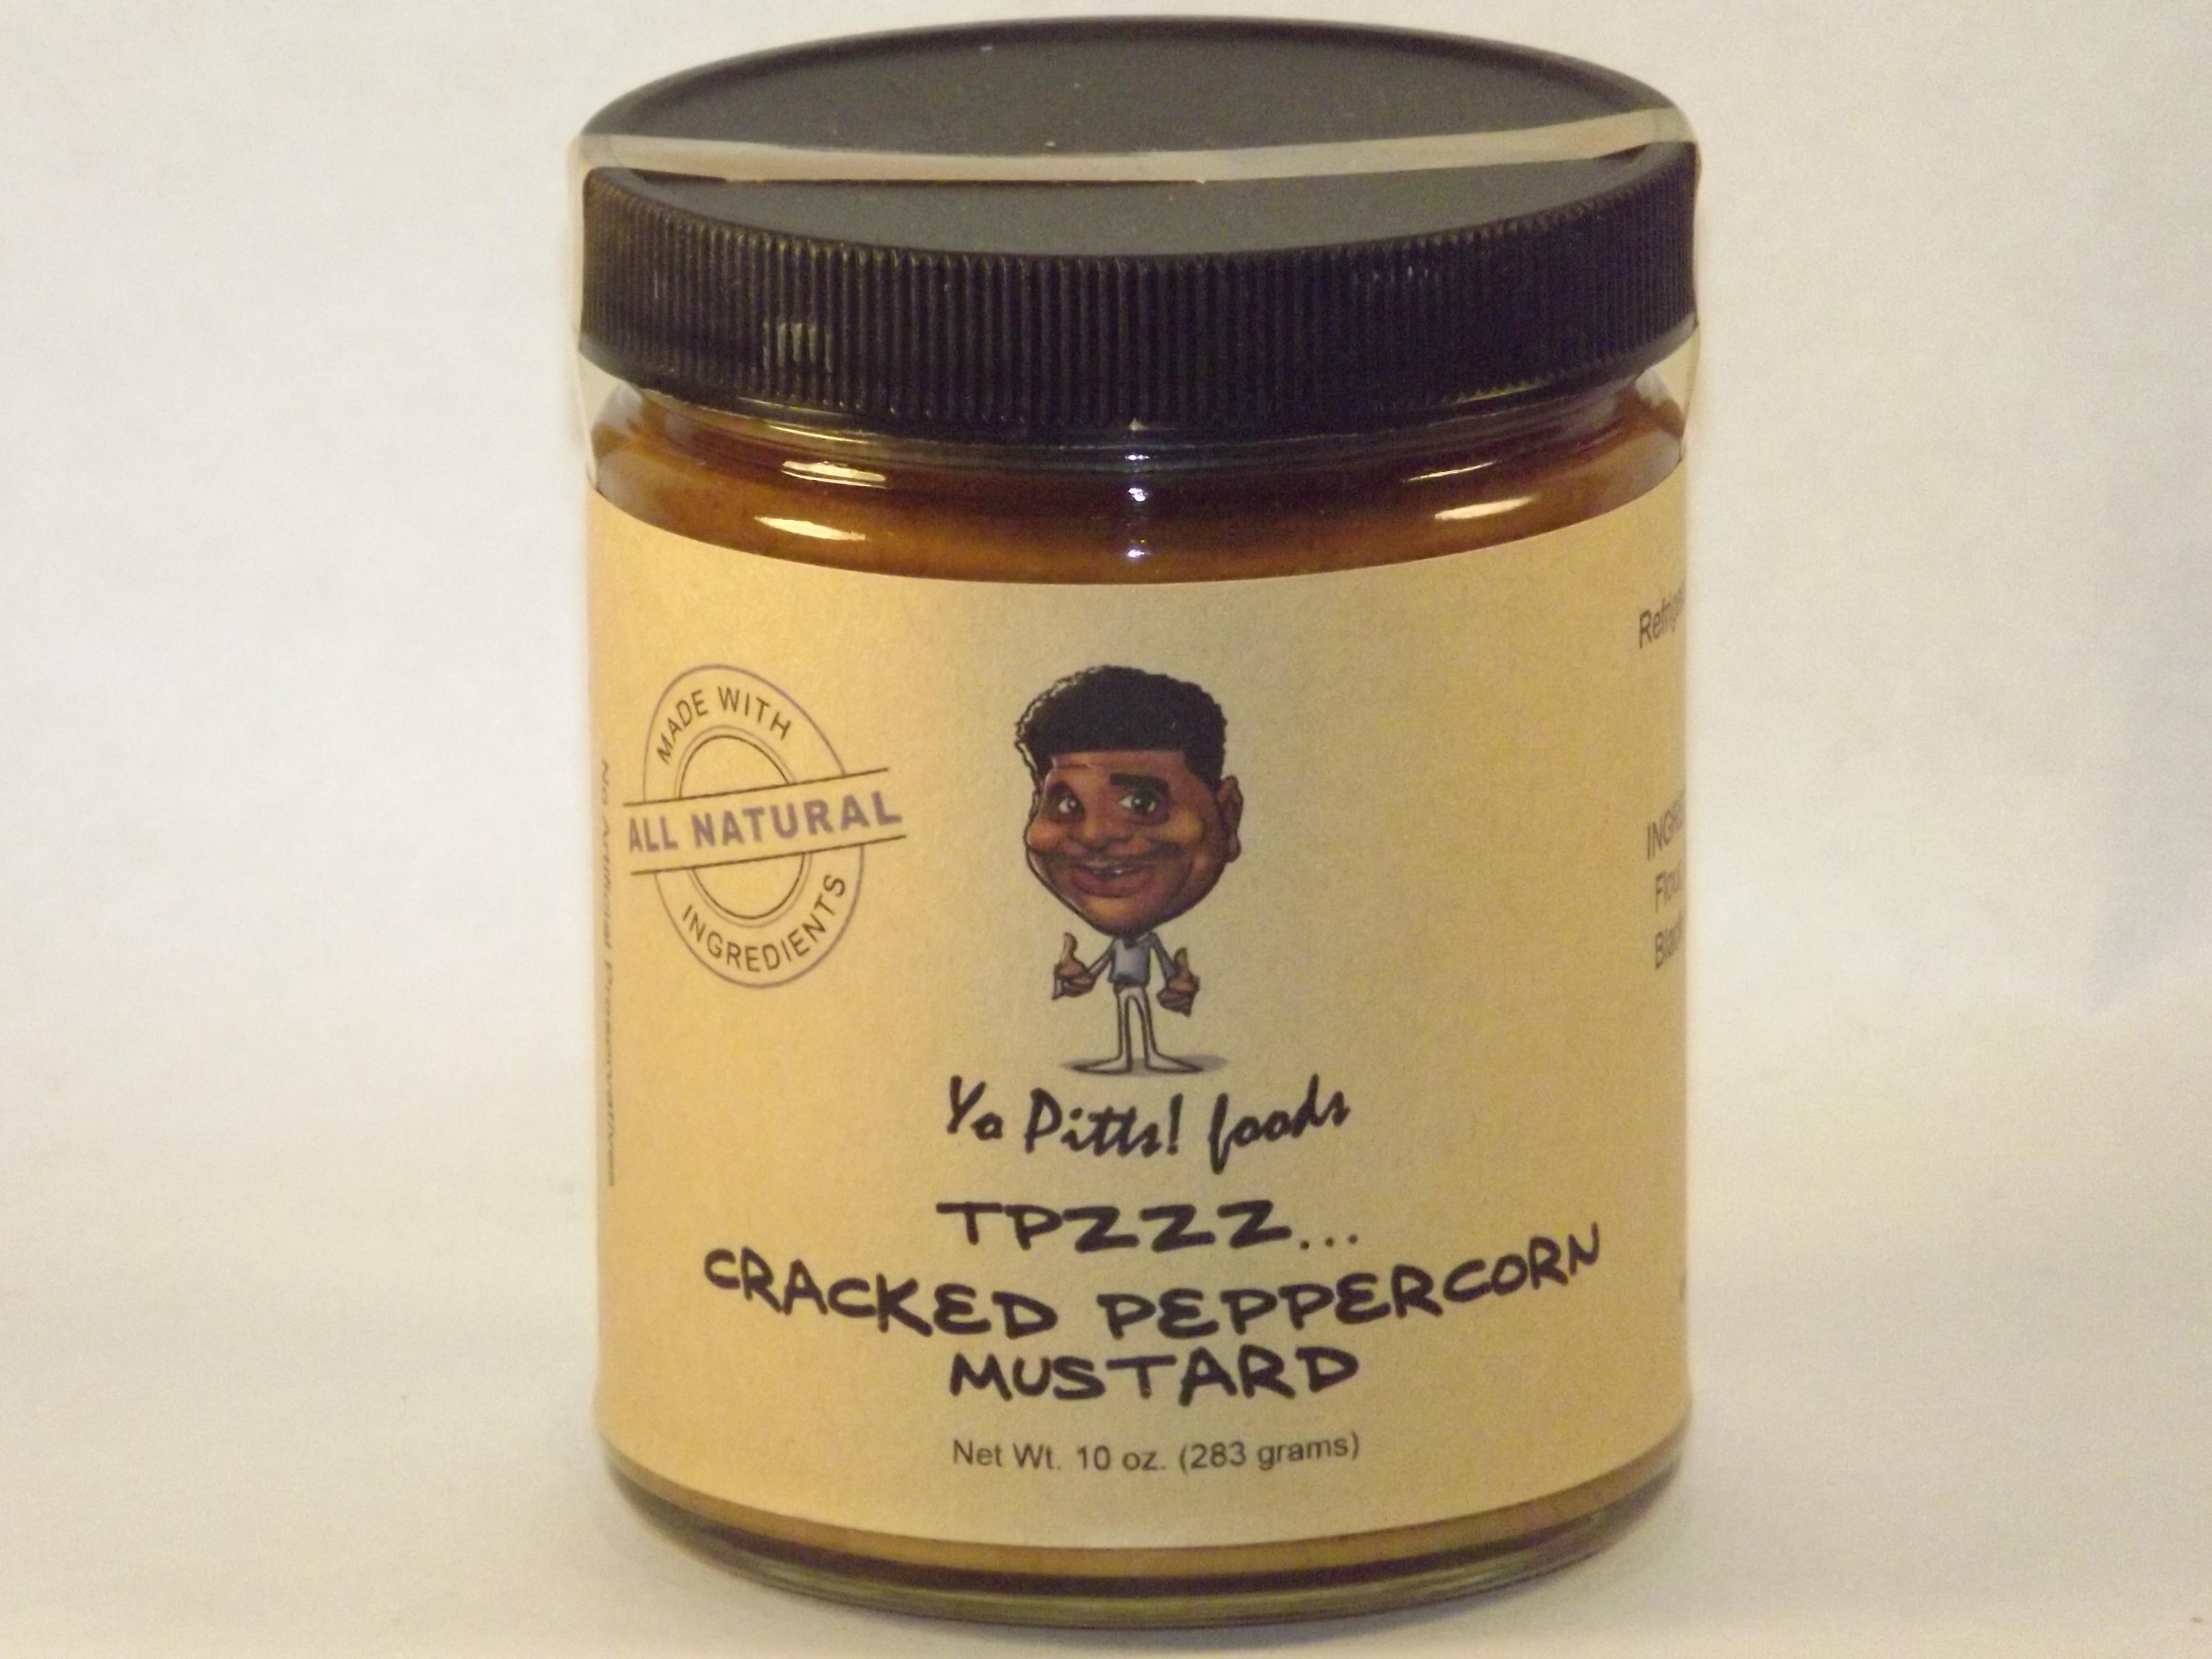 Yo Pitts! Foods Cracked Peppercorn Mustard